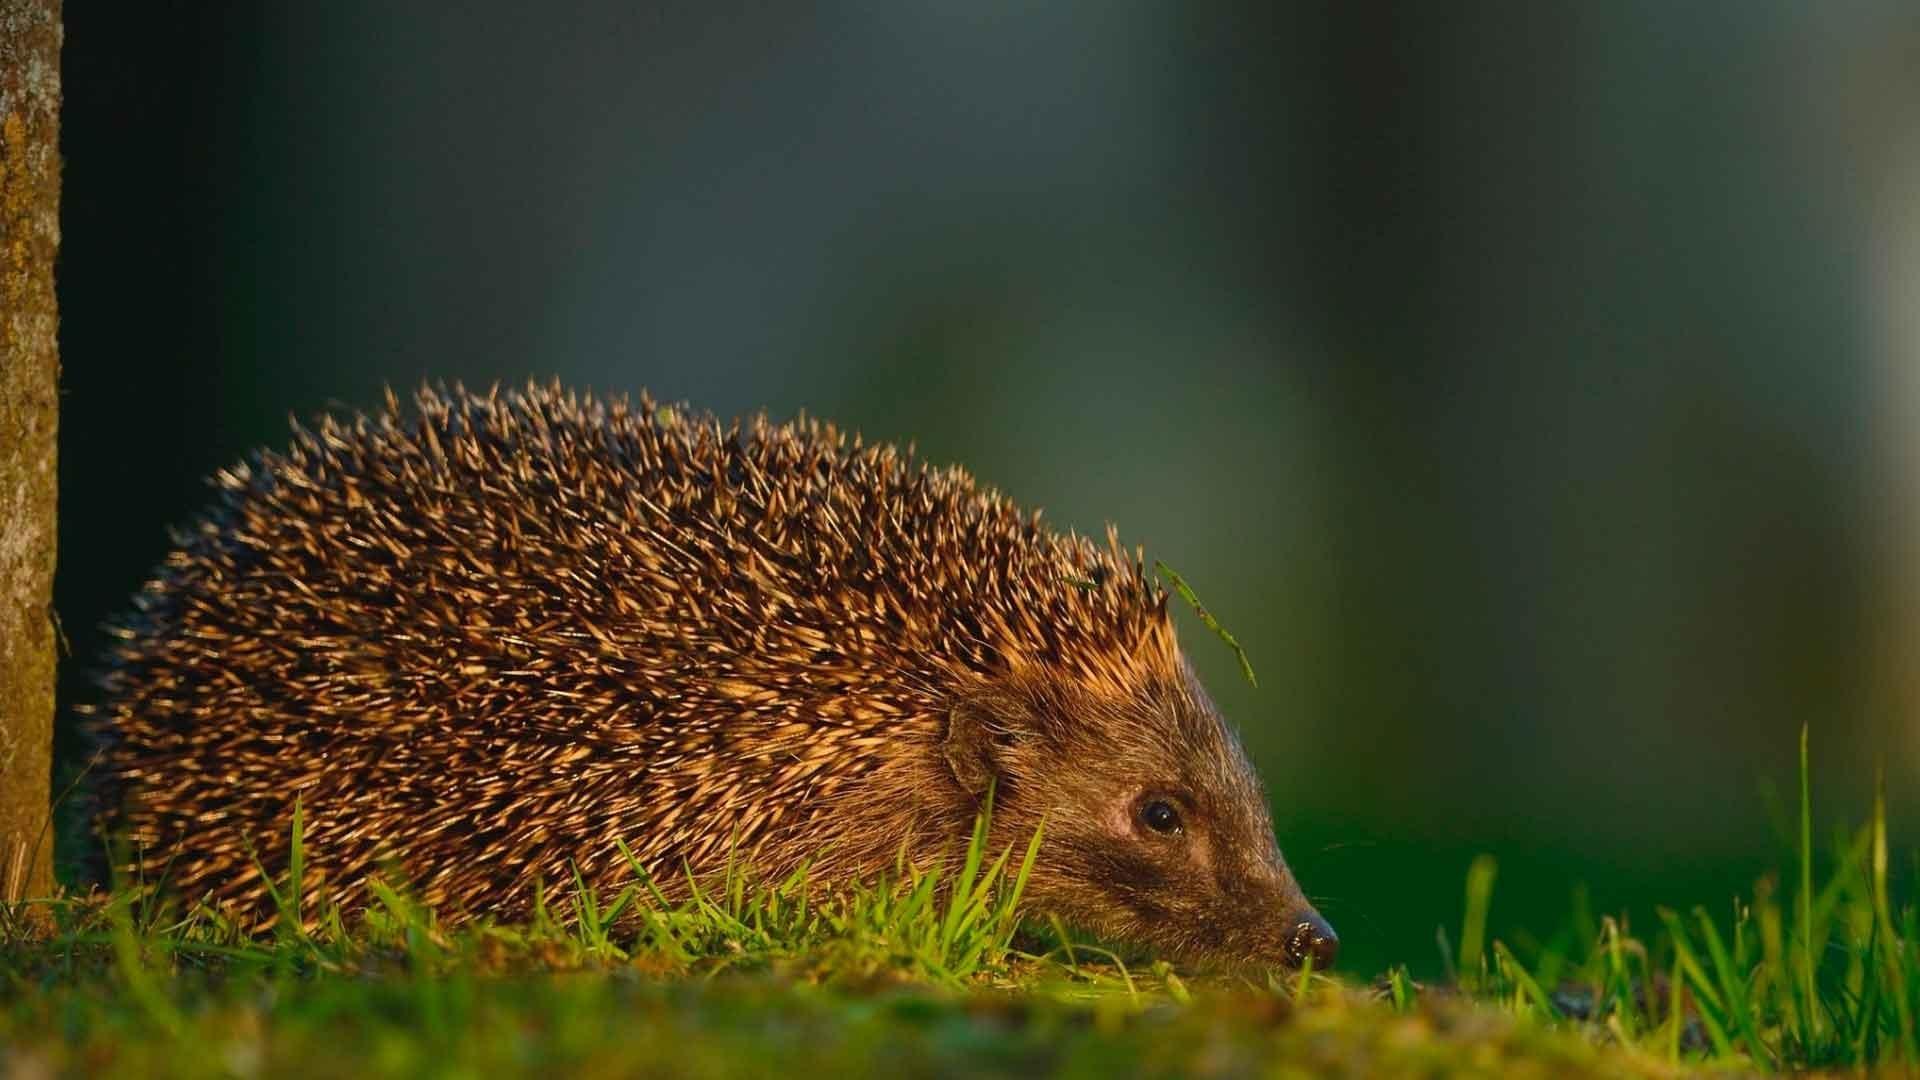 Hedgehog wallpaper photo hd